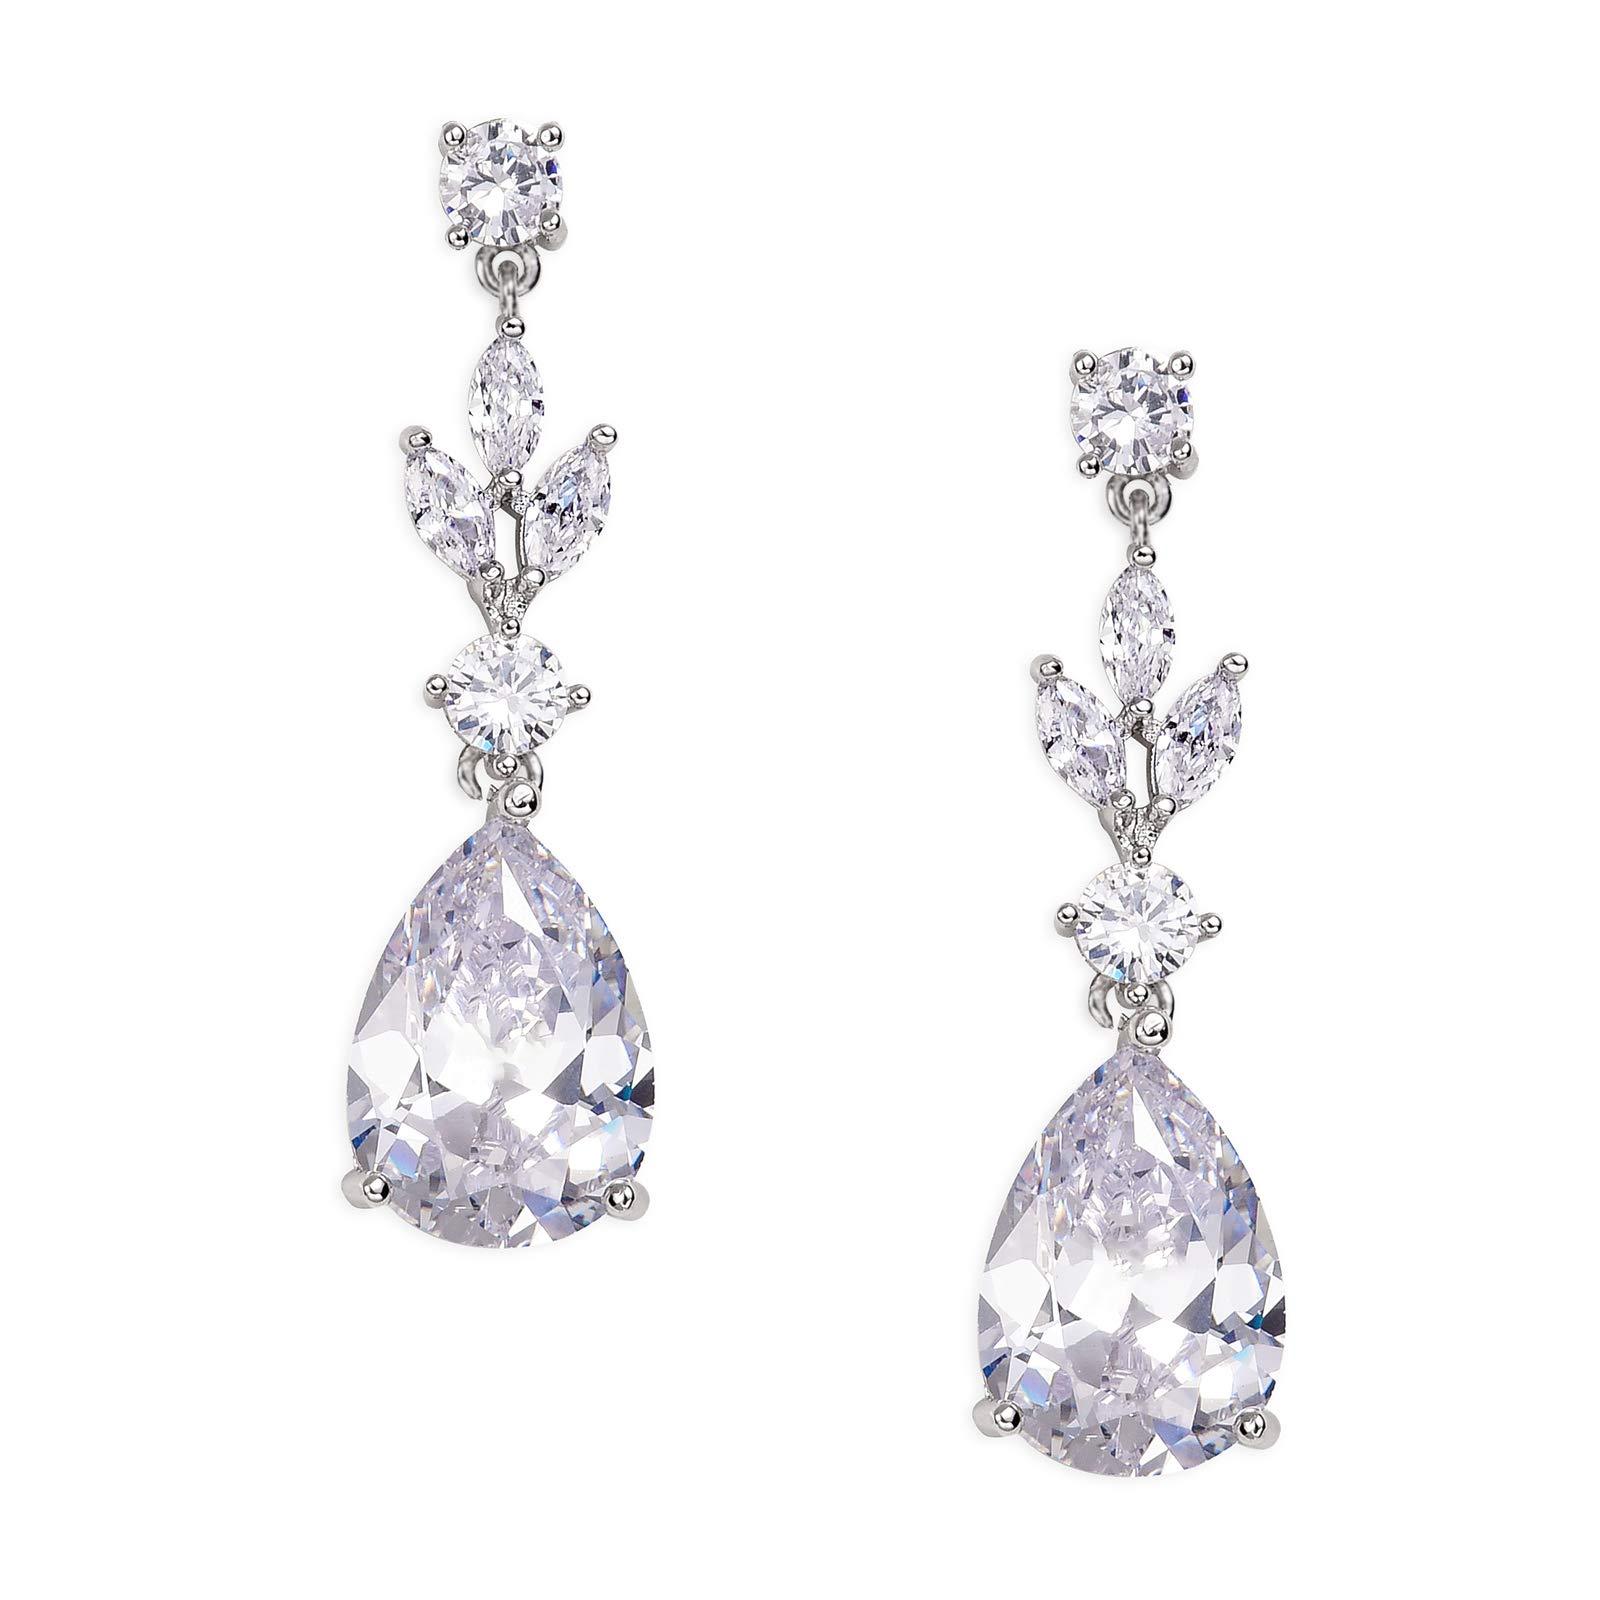 SWEETV Teardrop Wedding Earrings for Women,Bridesmaids,Brides -Rhinestones Earrings for Bridal,Prom,Formal-Silver